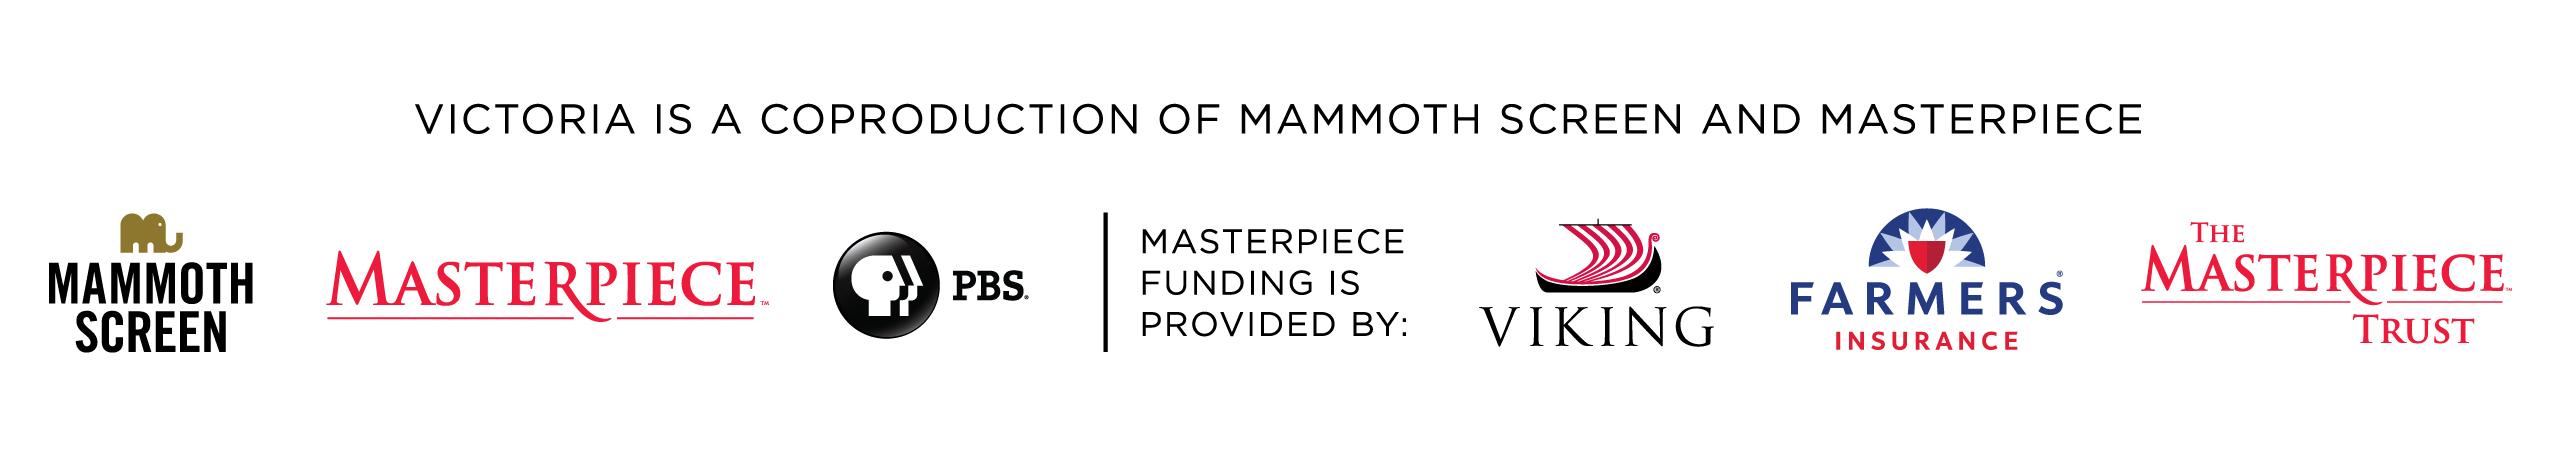 Victoria funding block